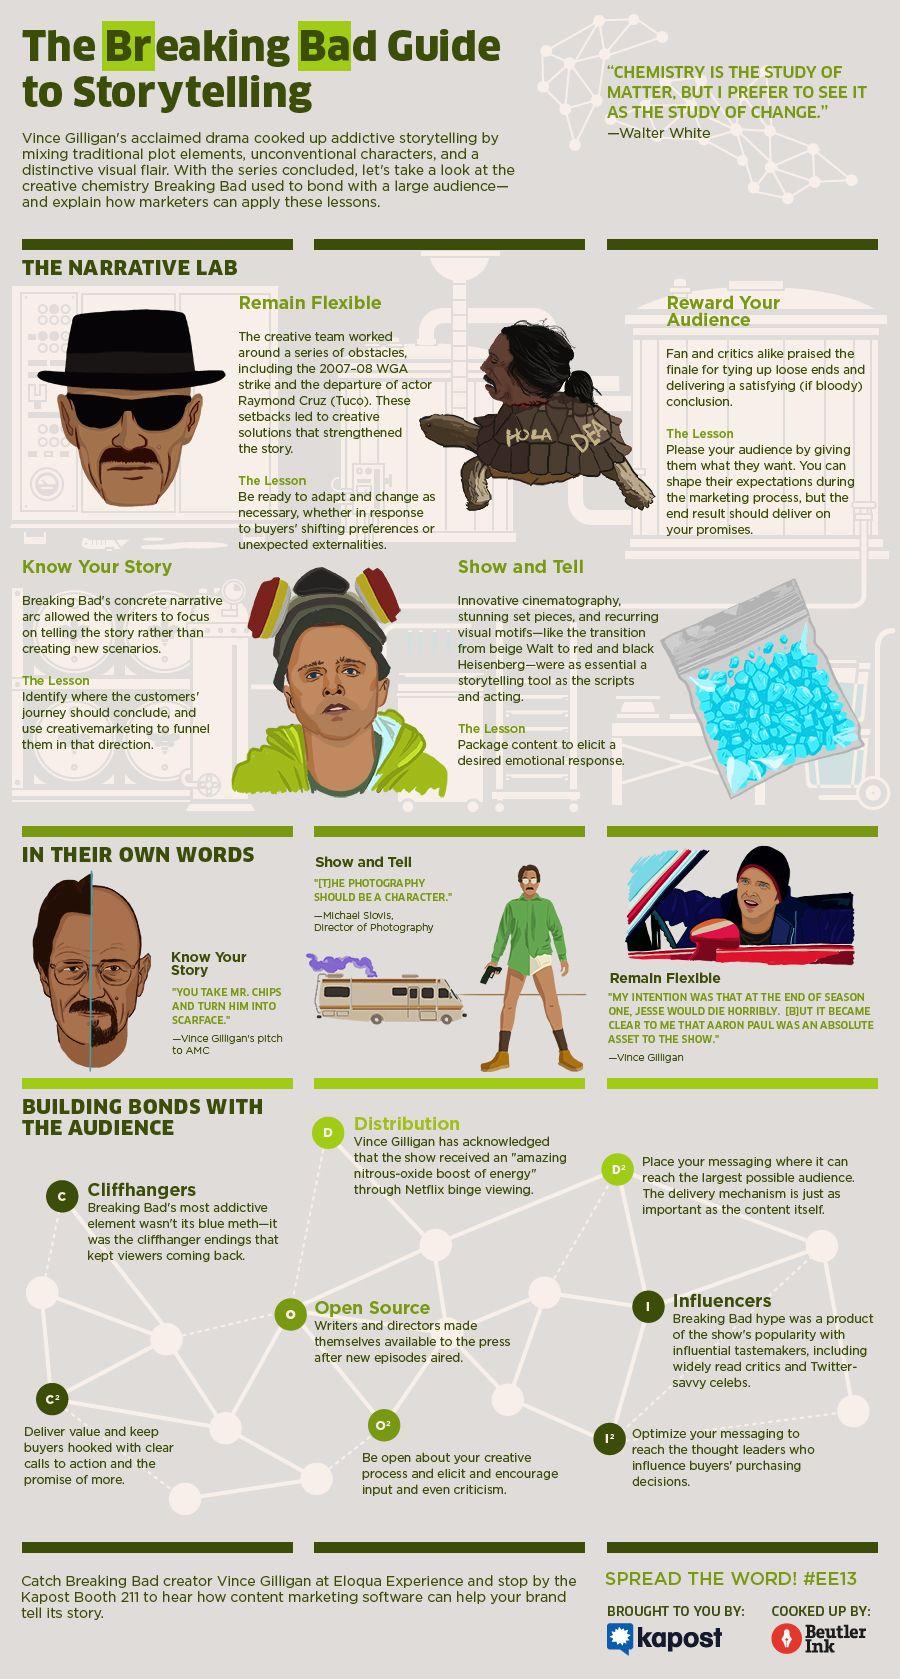 The Breaking Bad Guide to #Storytelling [Infographic] http://marketeer.kapost.com/2013/10/breaking-bad-guide-to-storytelling-infographic/